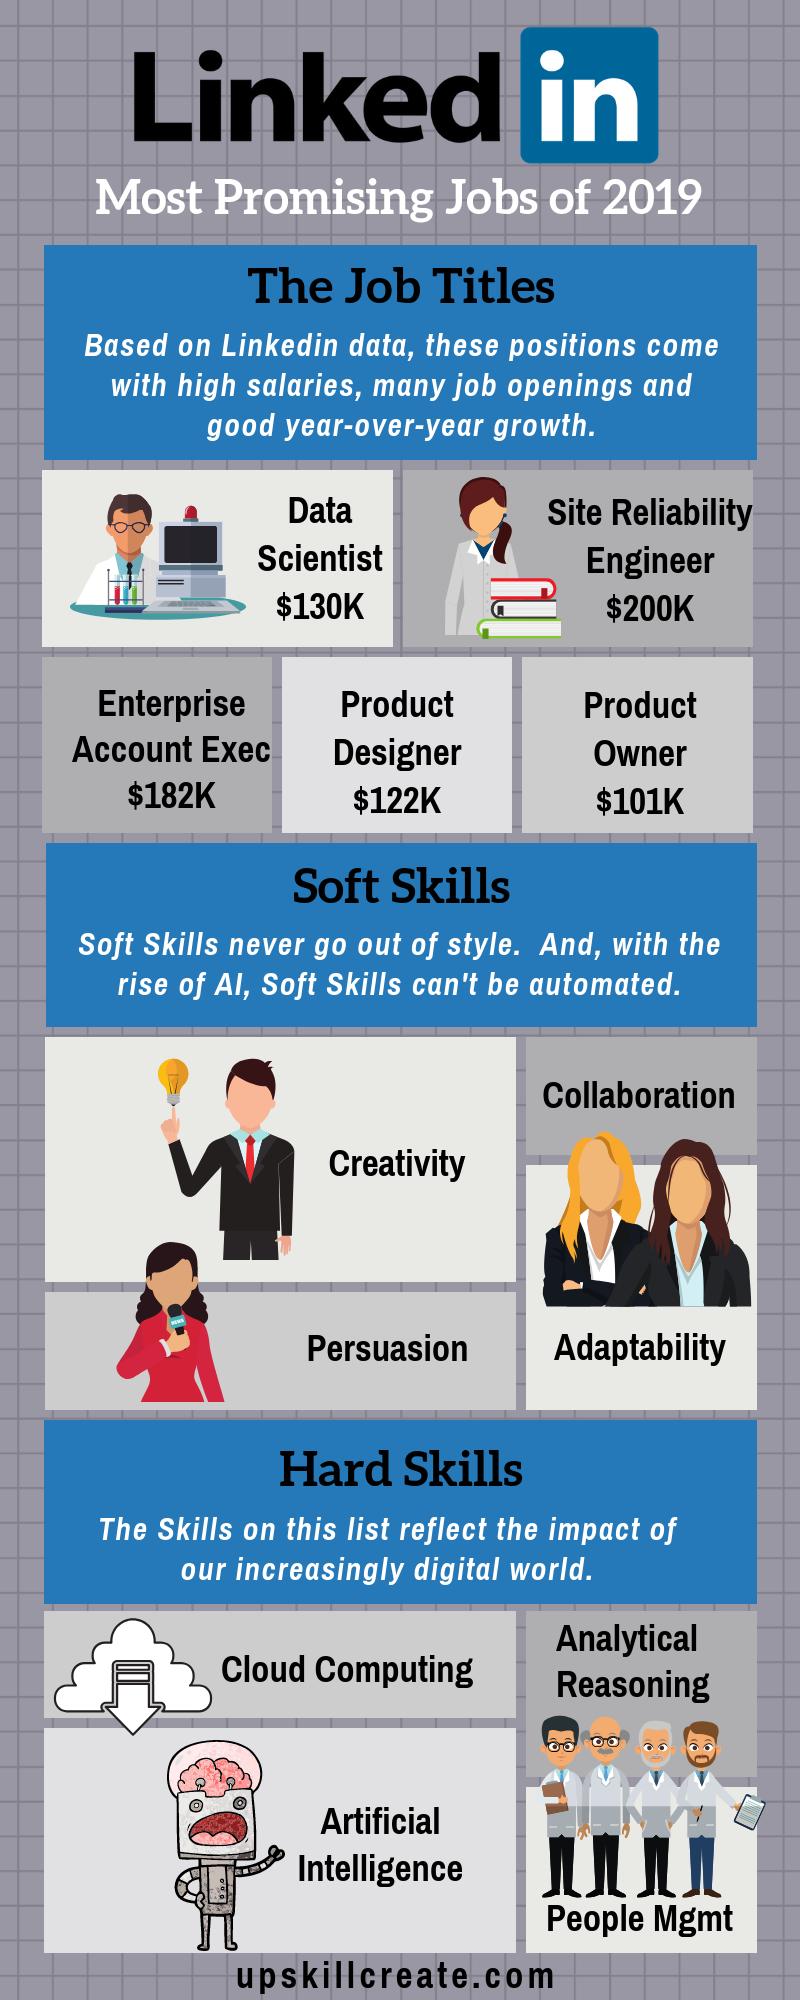 Linkedin top 10 jobs